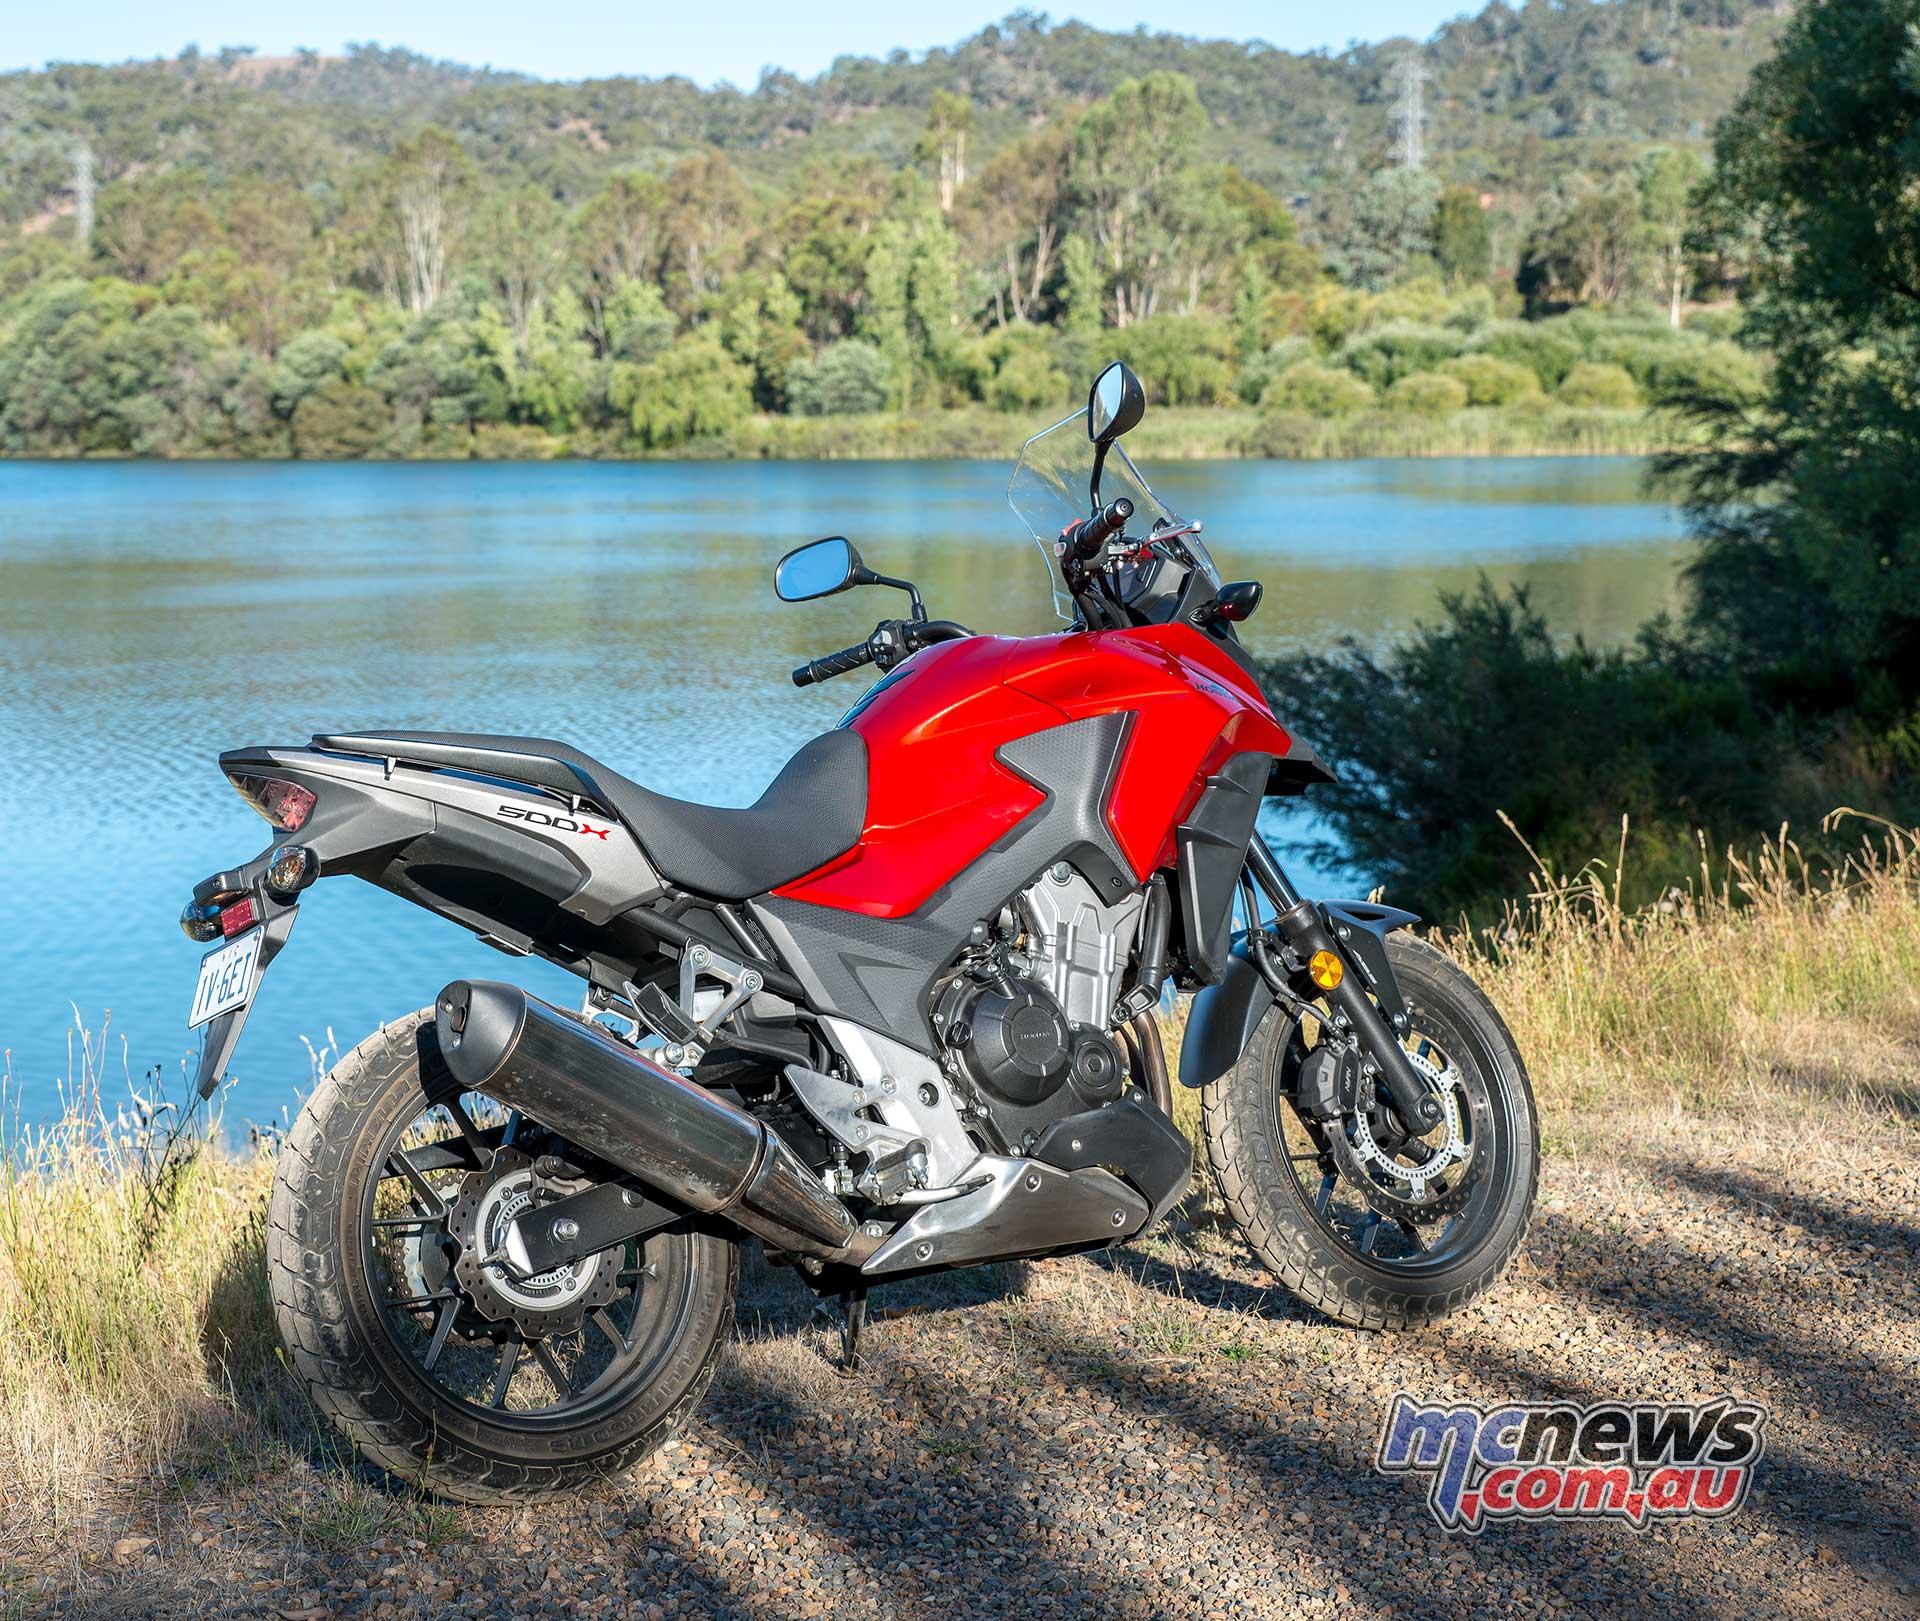 Honda CB500X Review | Motorcycle Tests | MCNews com au